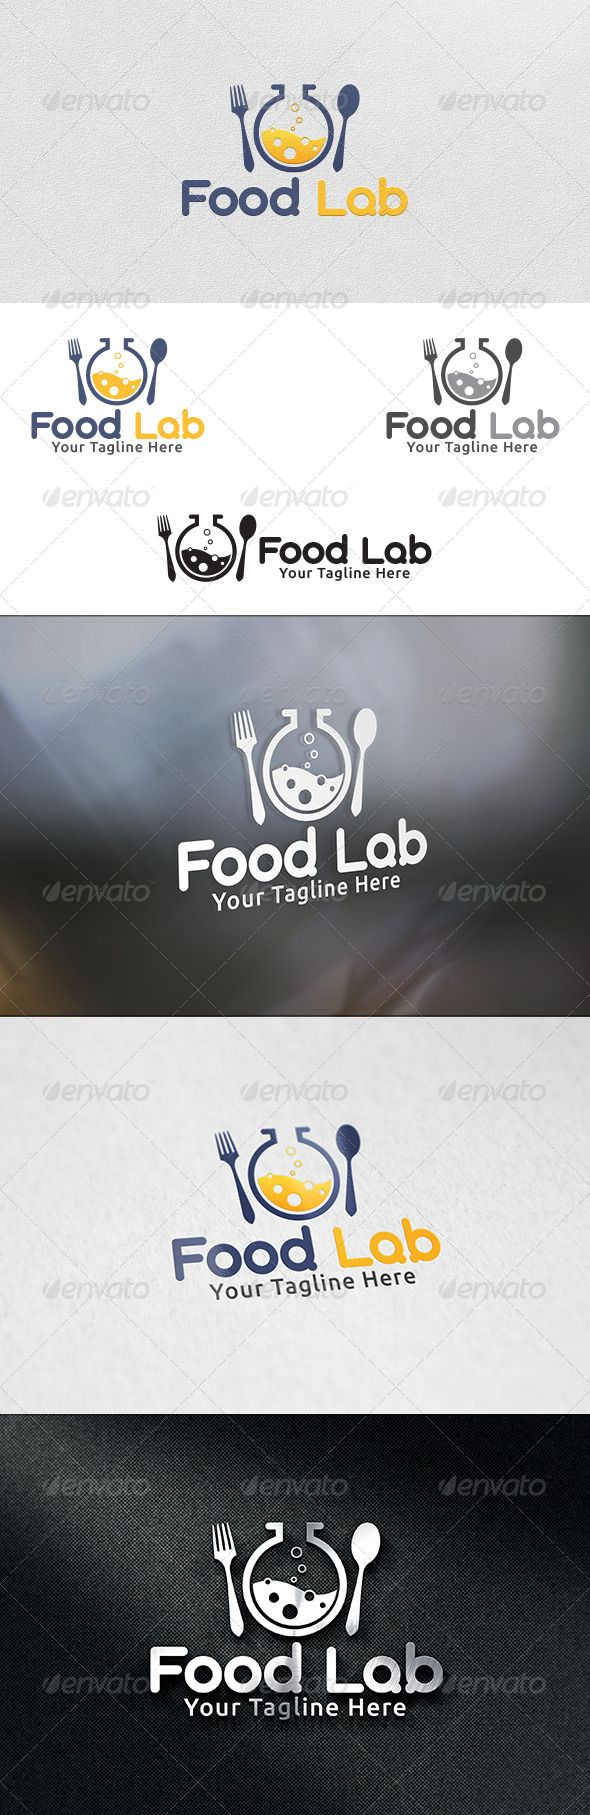 Food Lab - Logo Template